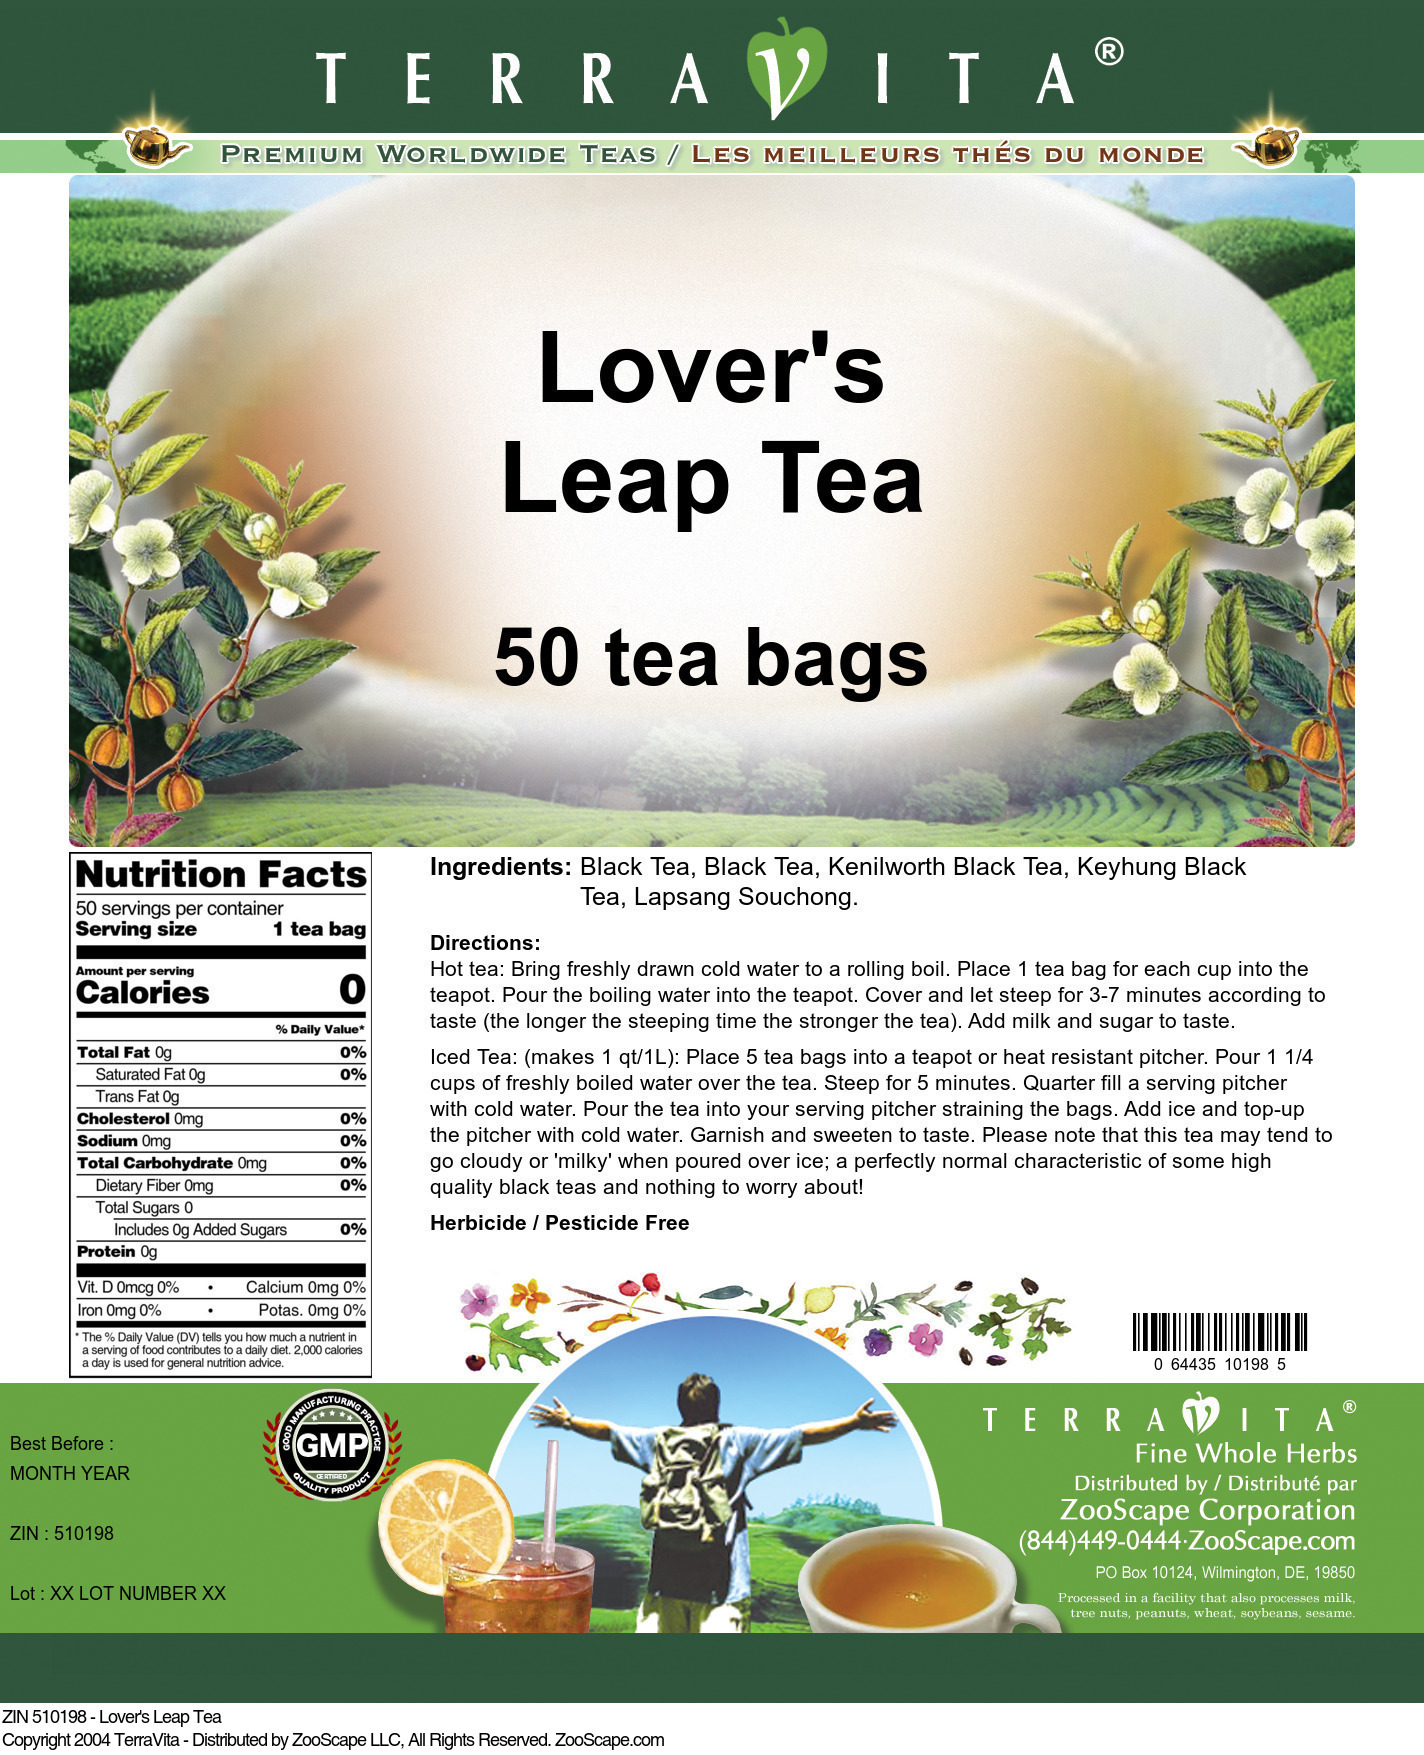 Lover's Leap Tea